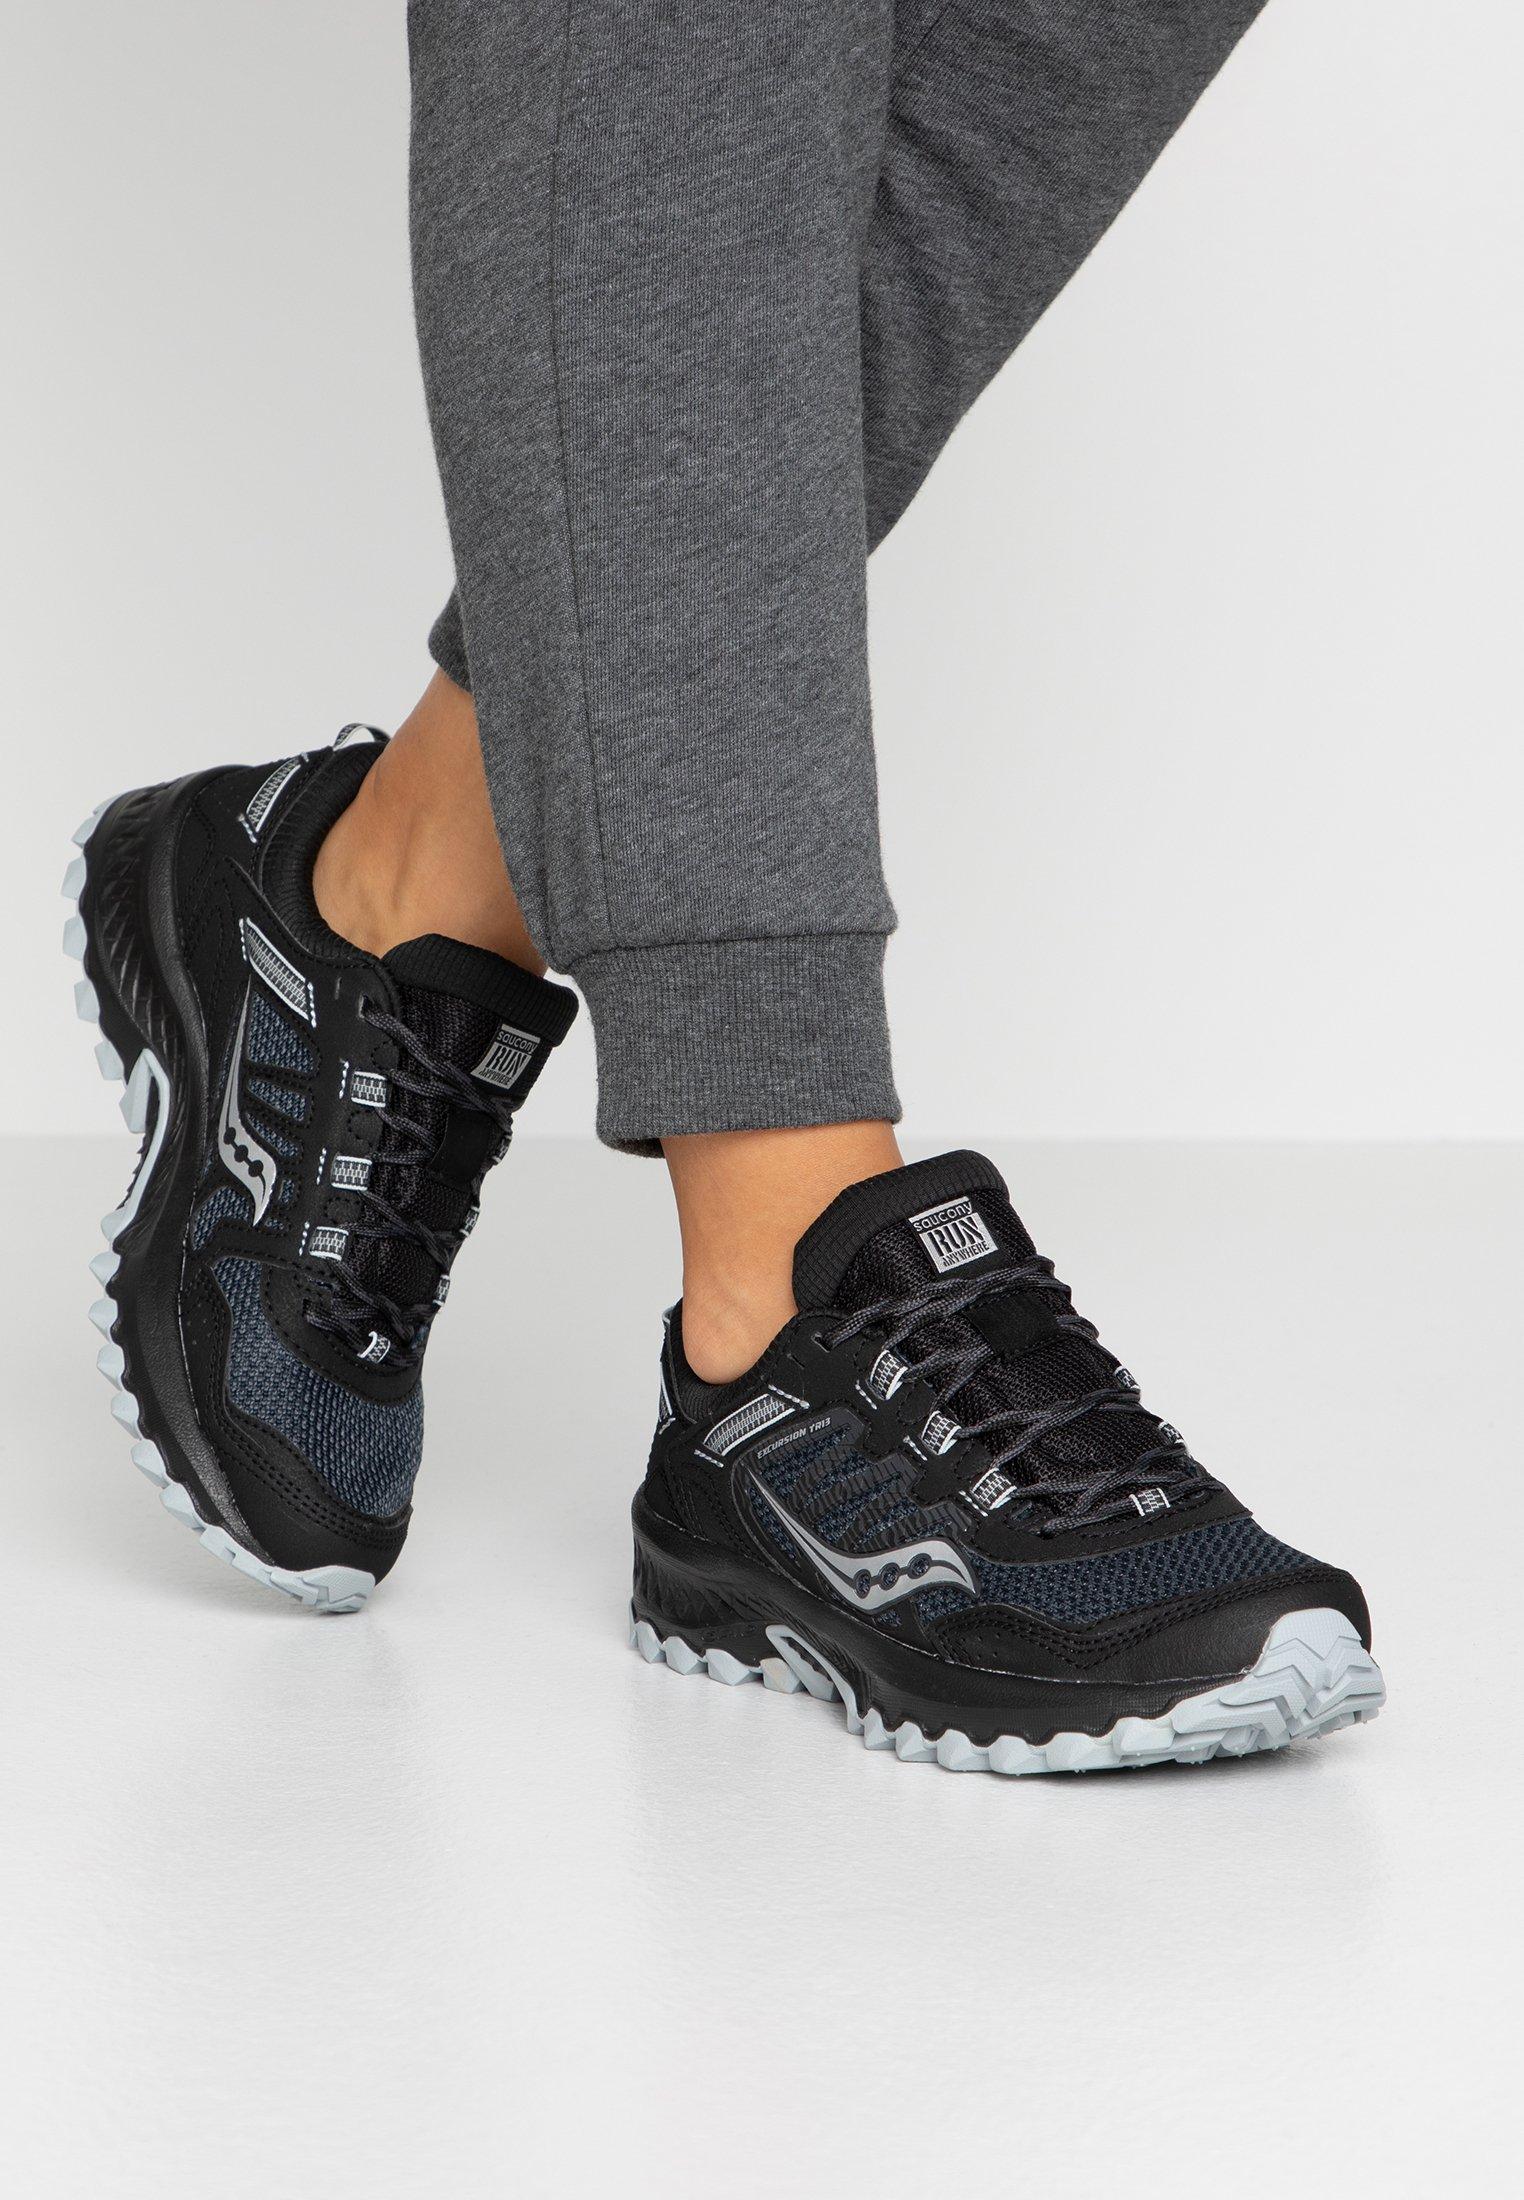 Saucony Tr13 - Sneakers Laag Black xlOp6bb9